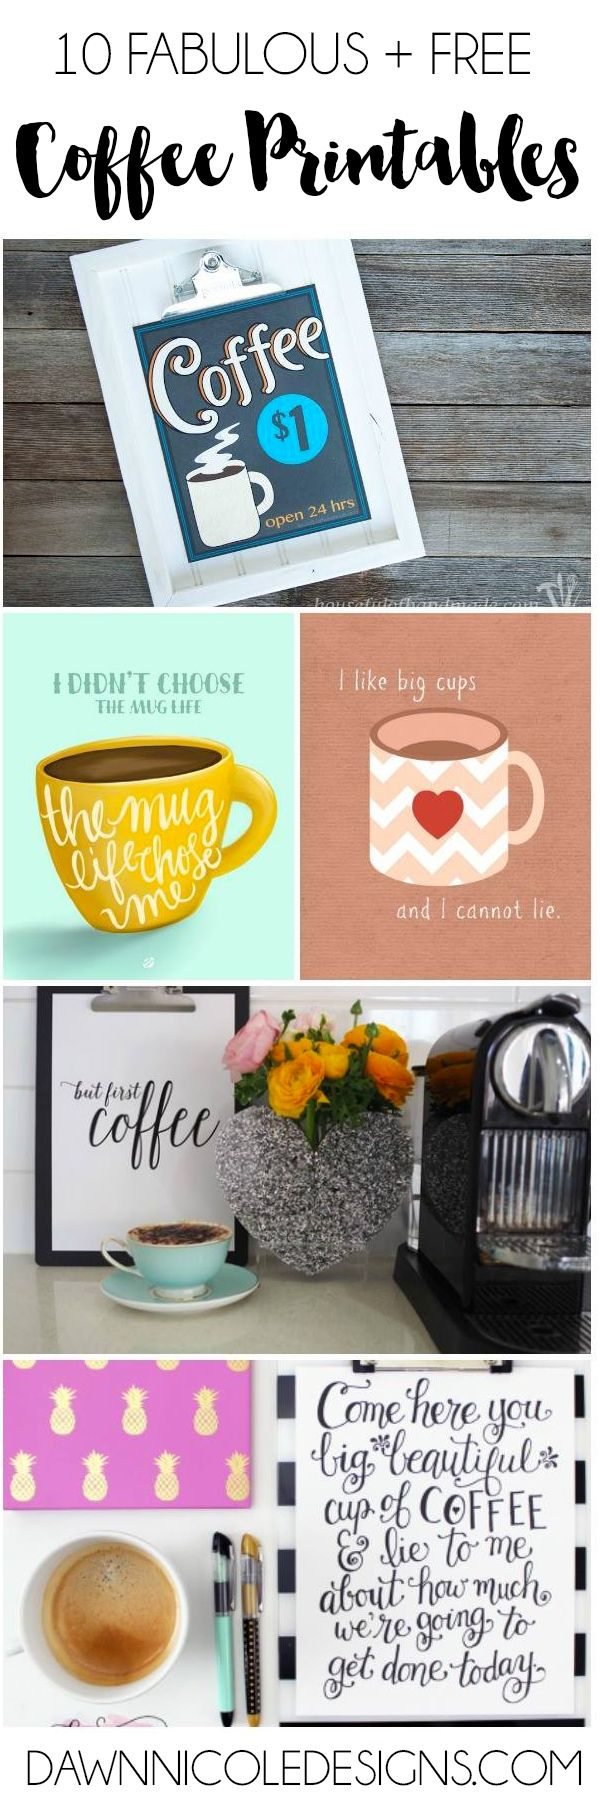 10 Free Coffee Printables | dawnnicoledesigns.com